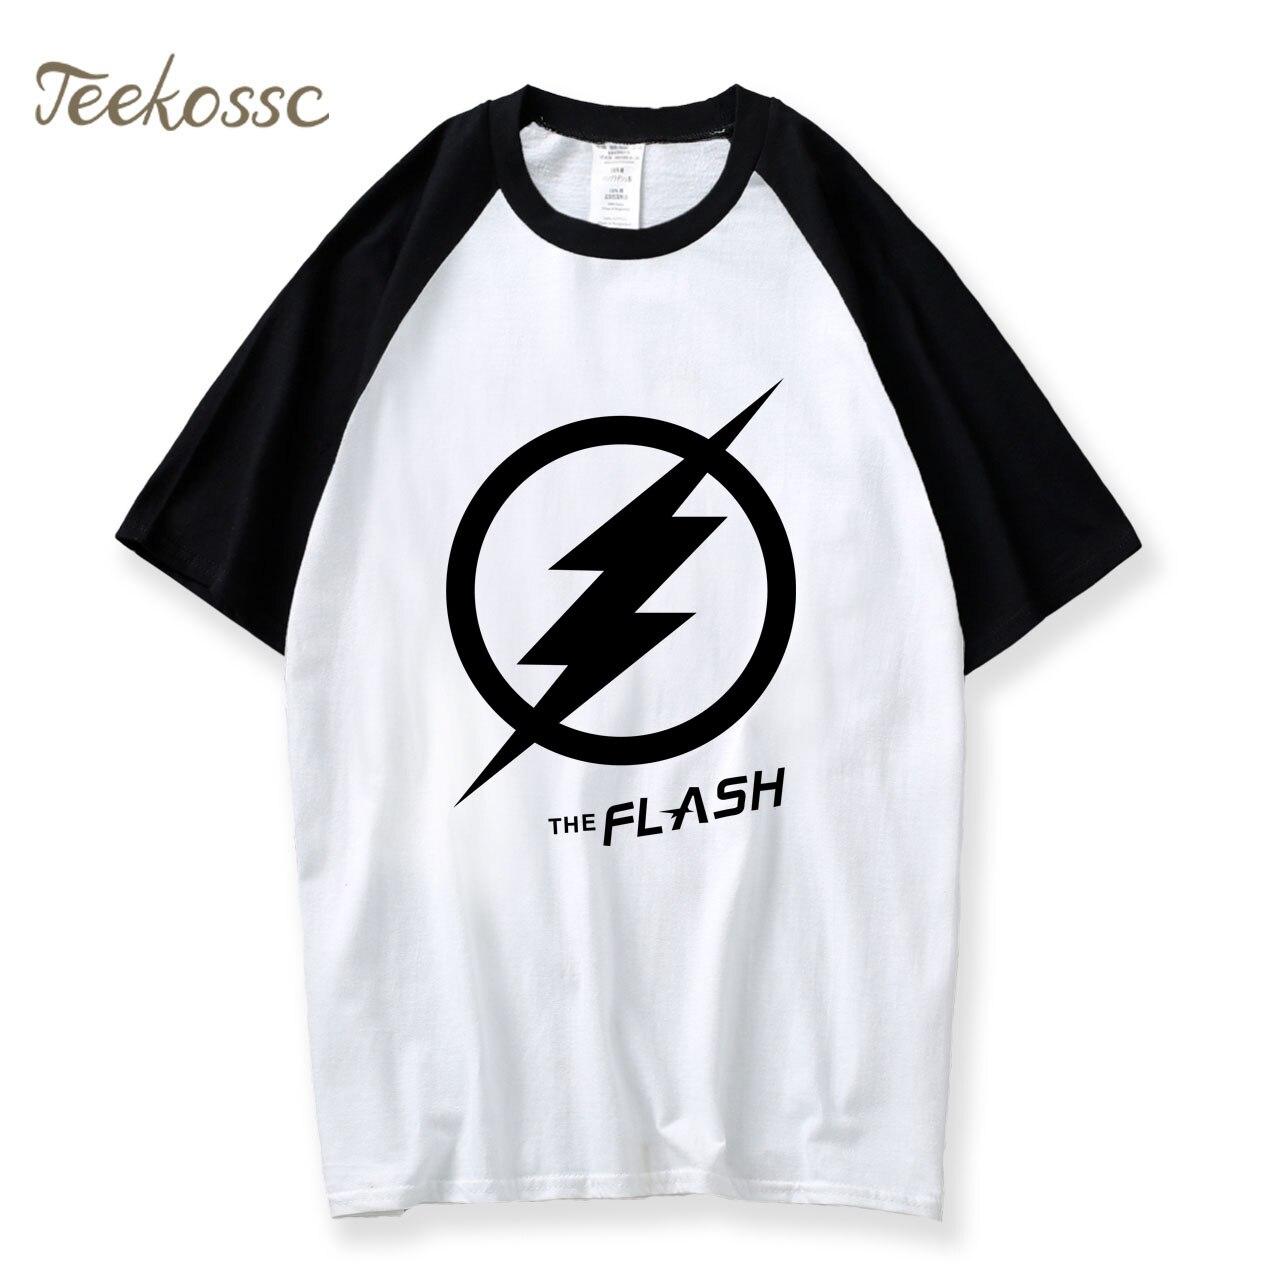 The Big Bang Theory T-Shirt The Flash Printed T Shirt 2018 Summer Fashion Raglan Casual Tshirts Cotton Short Sleeve Crossfit Tee